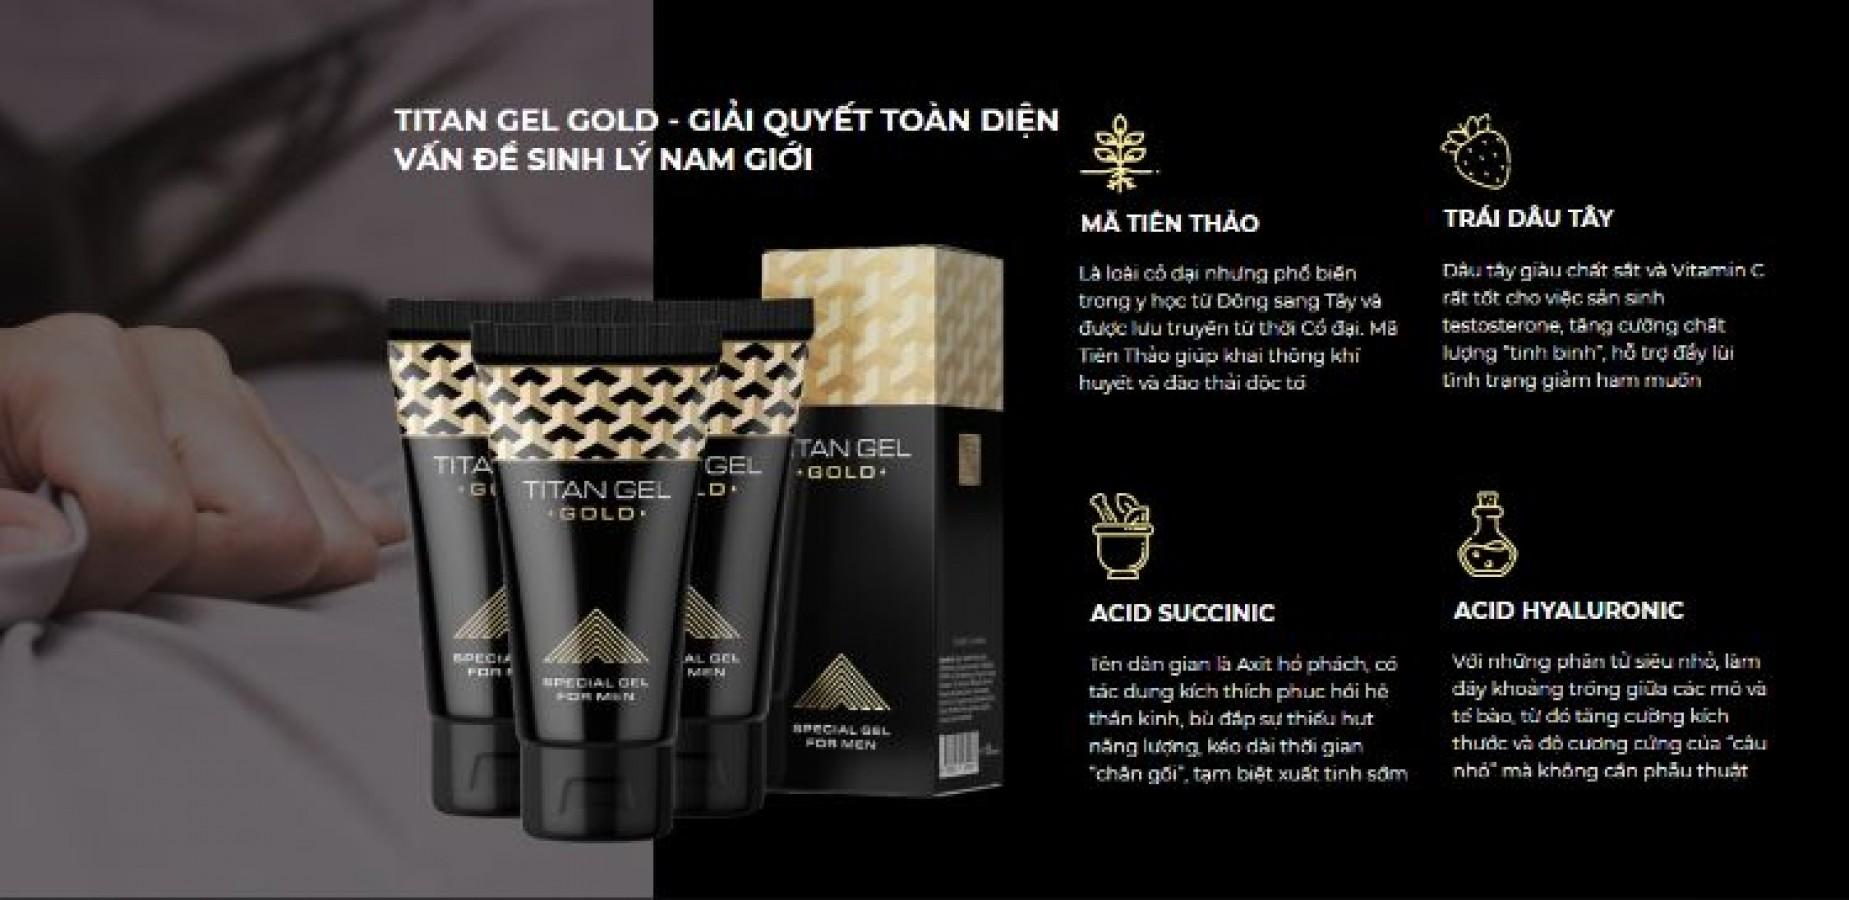 Titan Gel Gold Của Nga